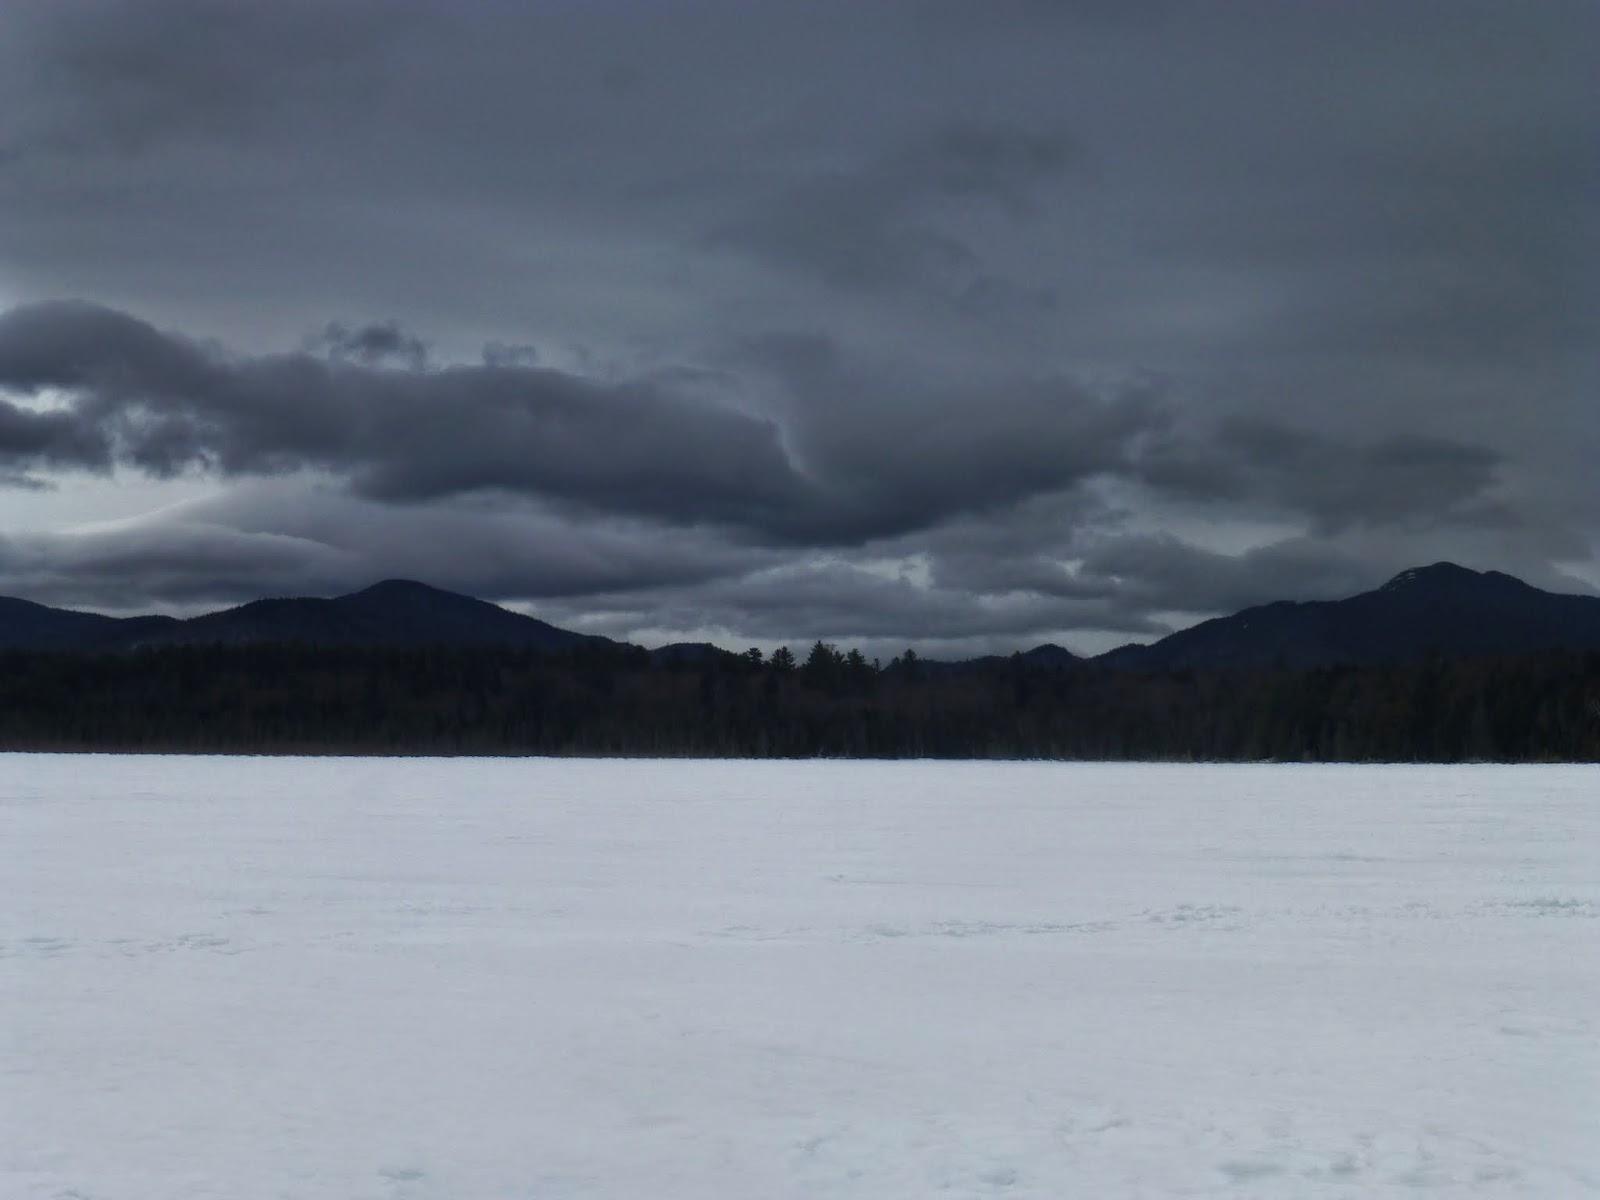 Off on Adventure: XC Ski - Pine Pond Trail - Lake Placid - 3